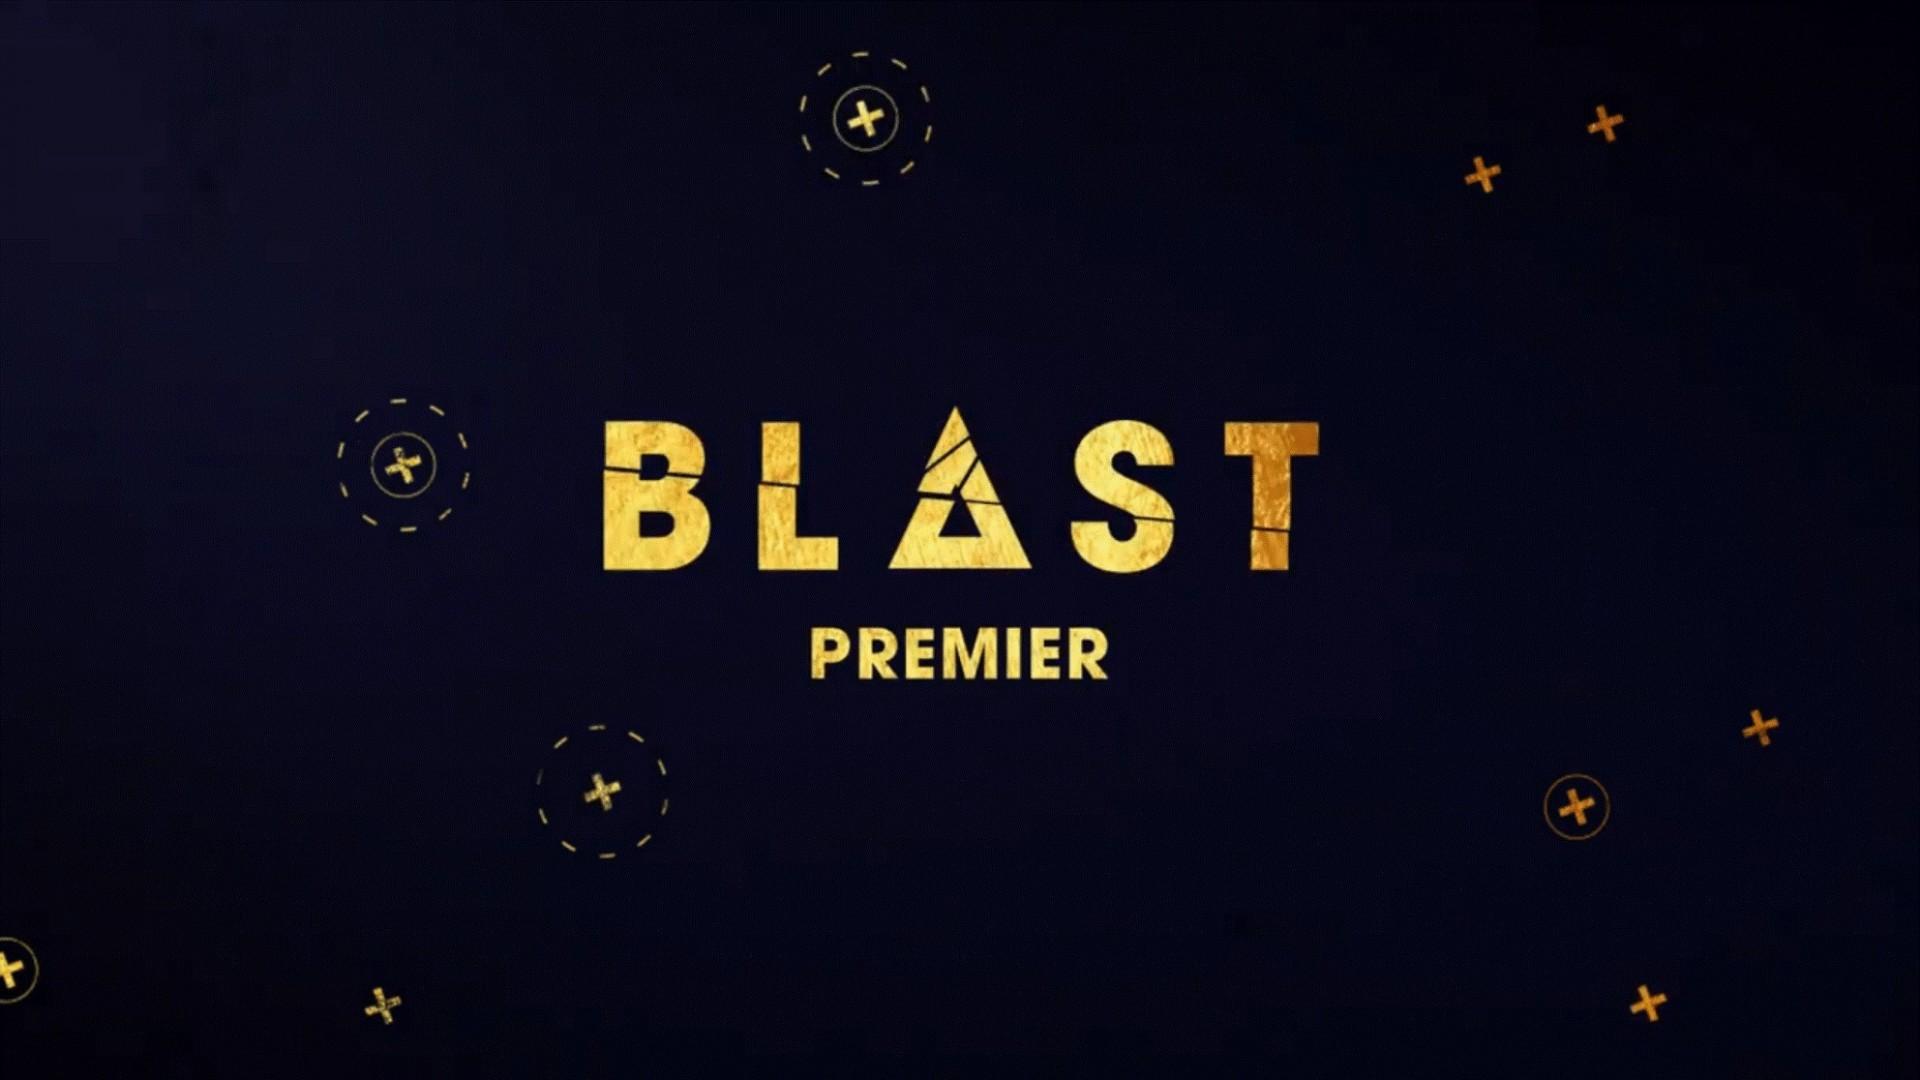 BLAST Premier Fall 2021 Groups обзор предстоящего турнира по CSGO